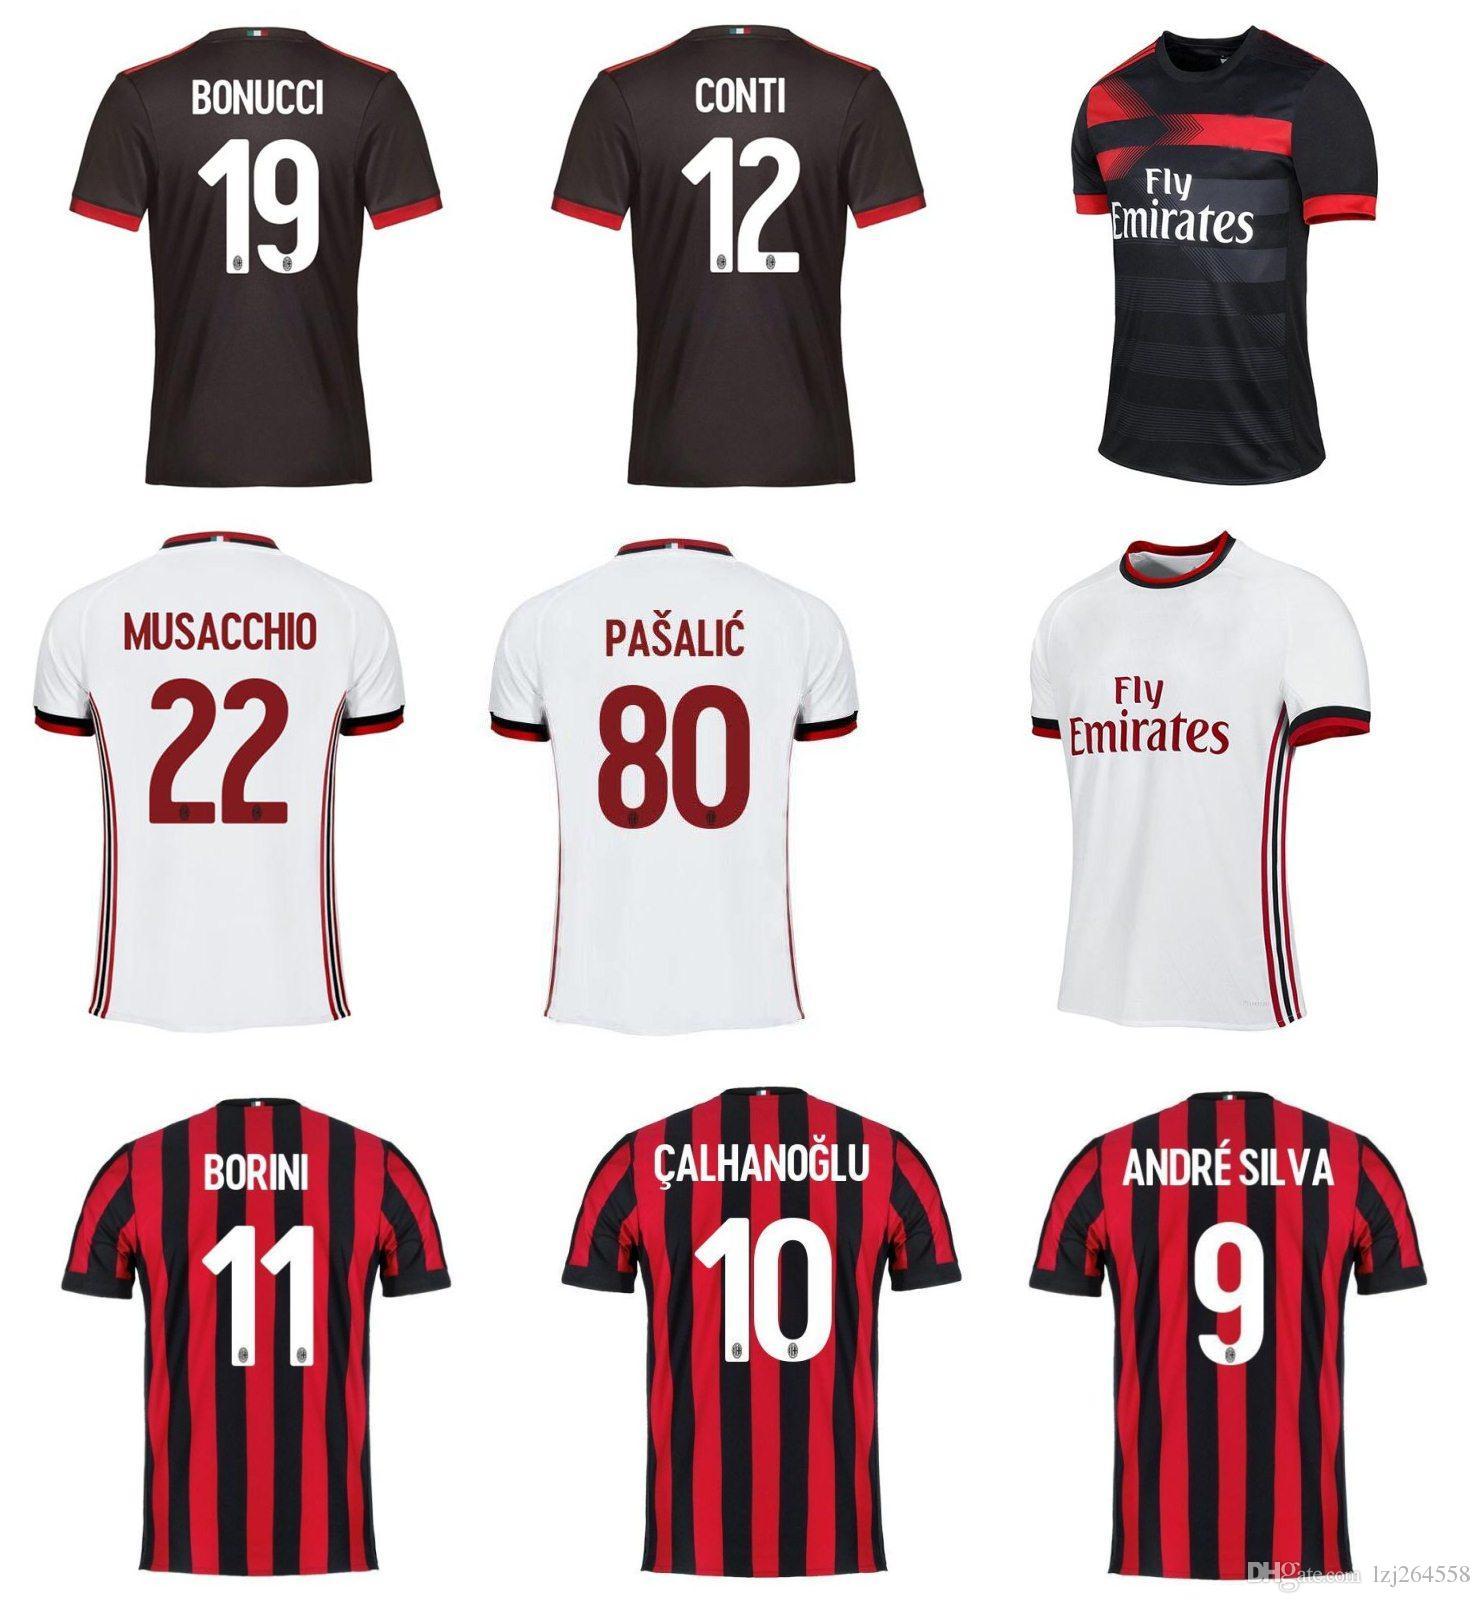 2019 Whosales AC Milan Football Shirt 2018 Soccer Jerseys Uniform 2017  Borini Andre Silva Bonucci R.Rodrigues Calhanoglu KaKa Romagnoli 17 18 TOP  From ... 8ffa730ee